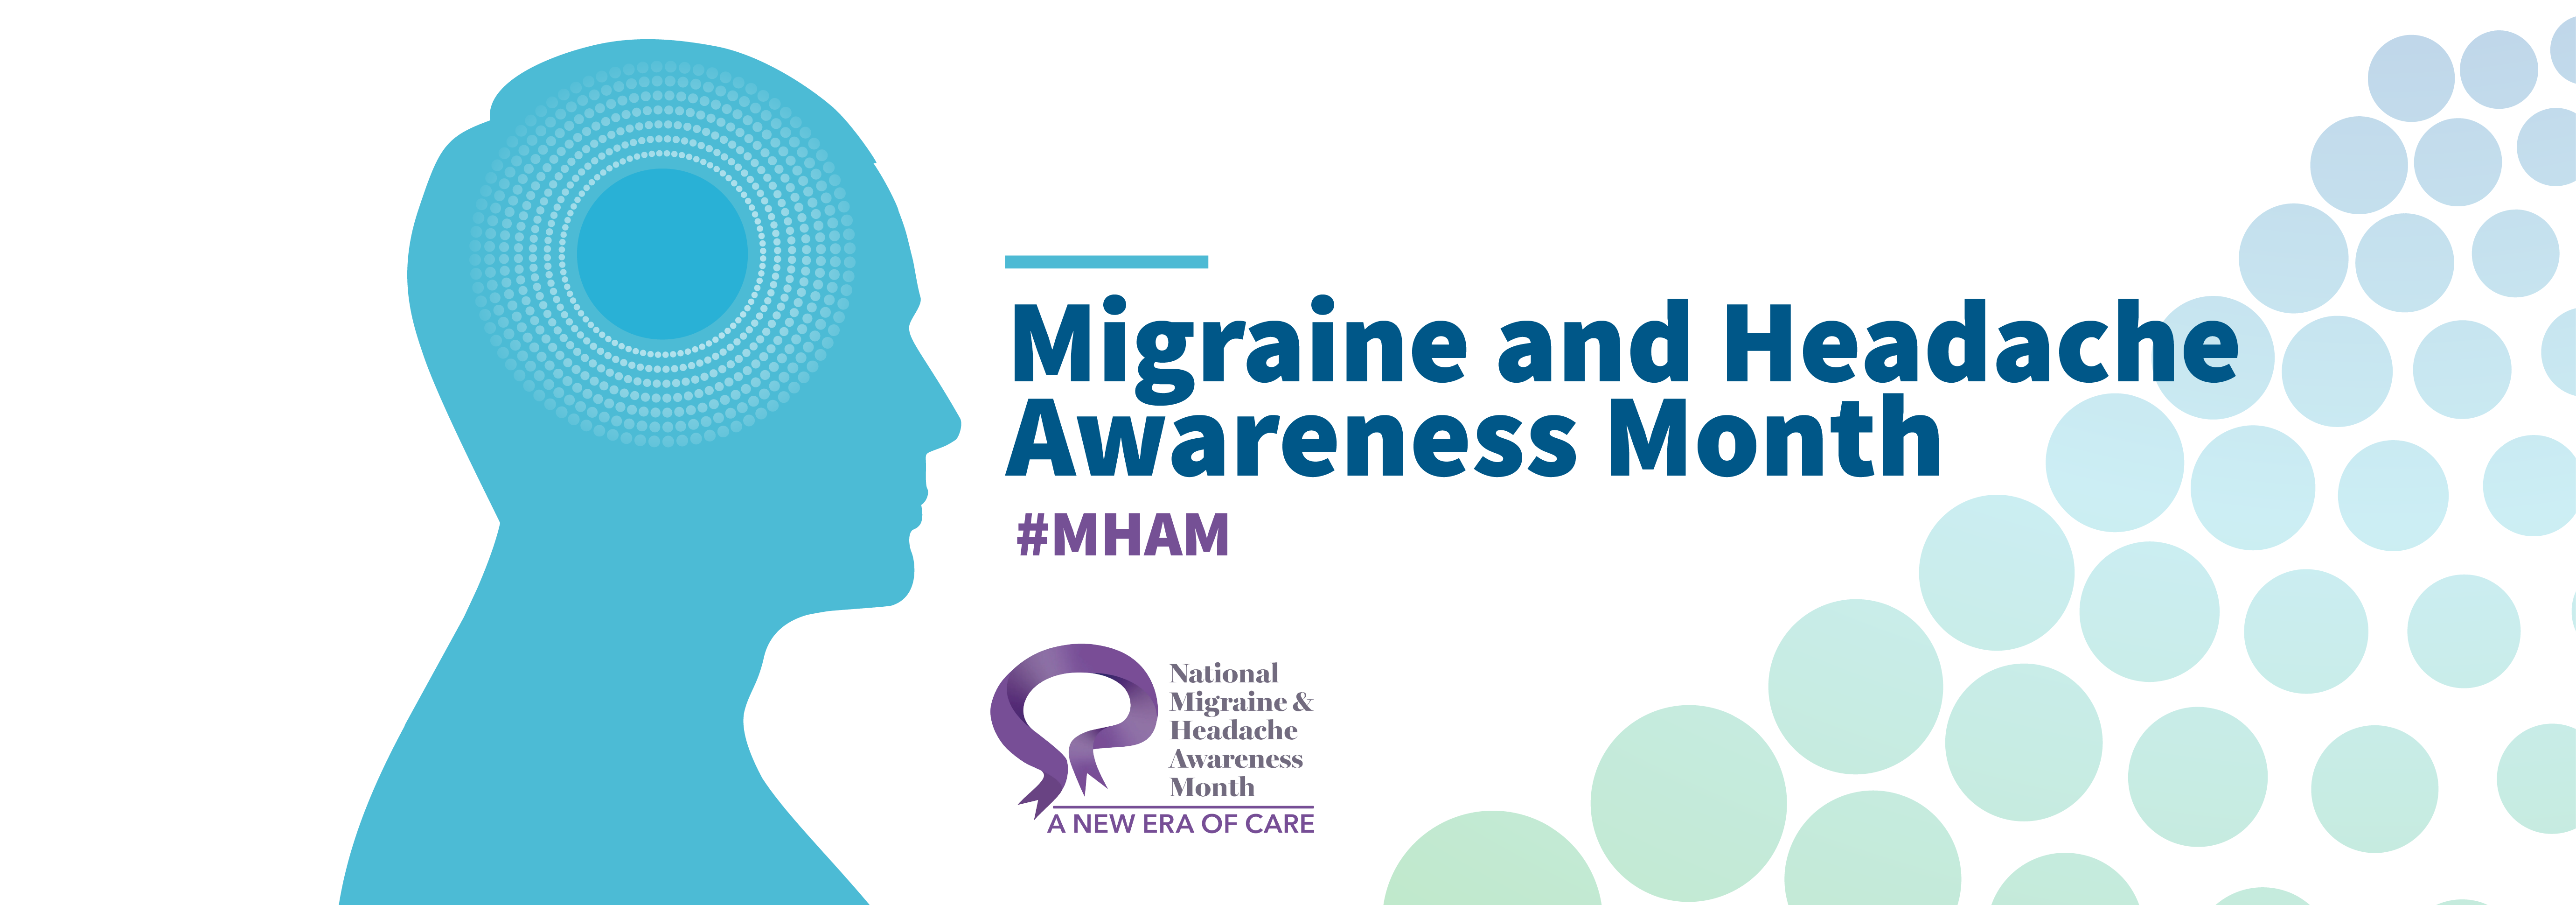 Headache awareness month at each PSA texan pain clinic